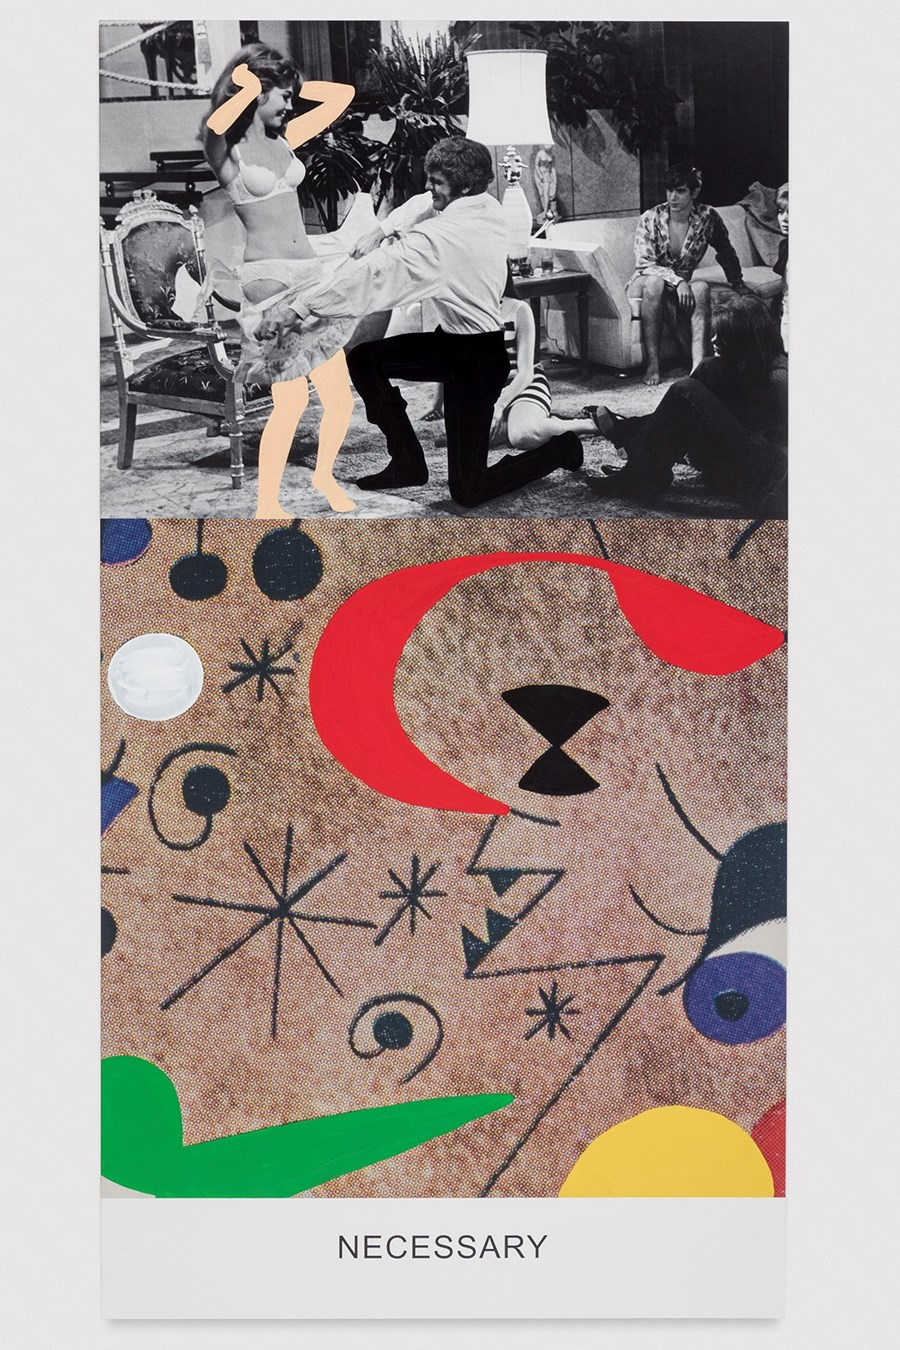 'Necessary', Copyright John Baldessari, courtesy the artist and Marian Goodman Gallery